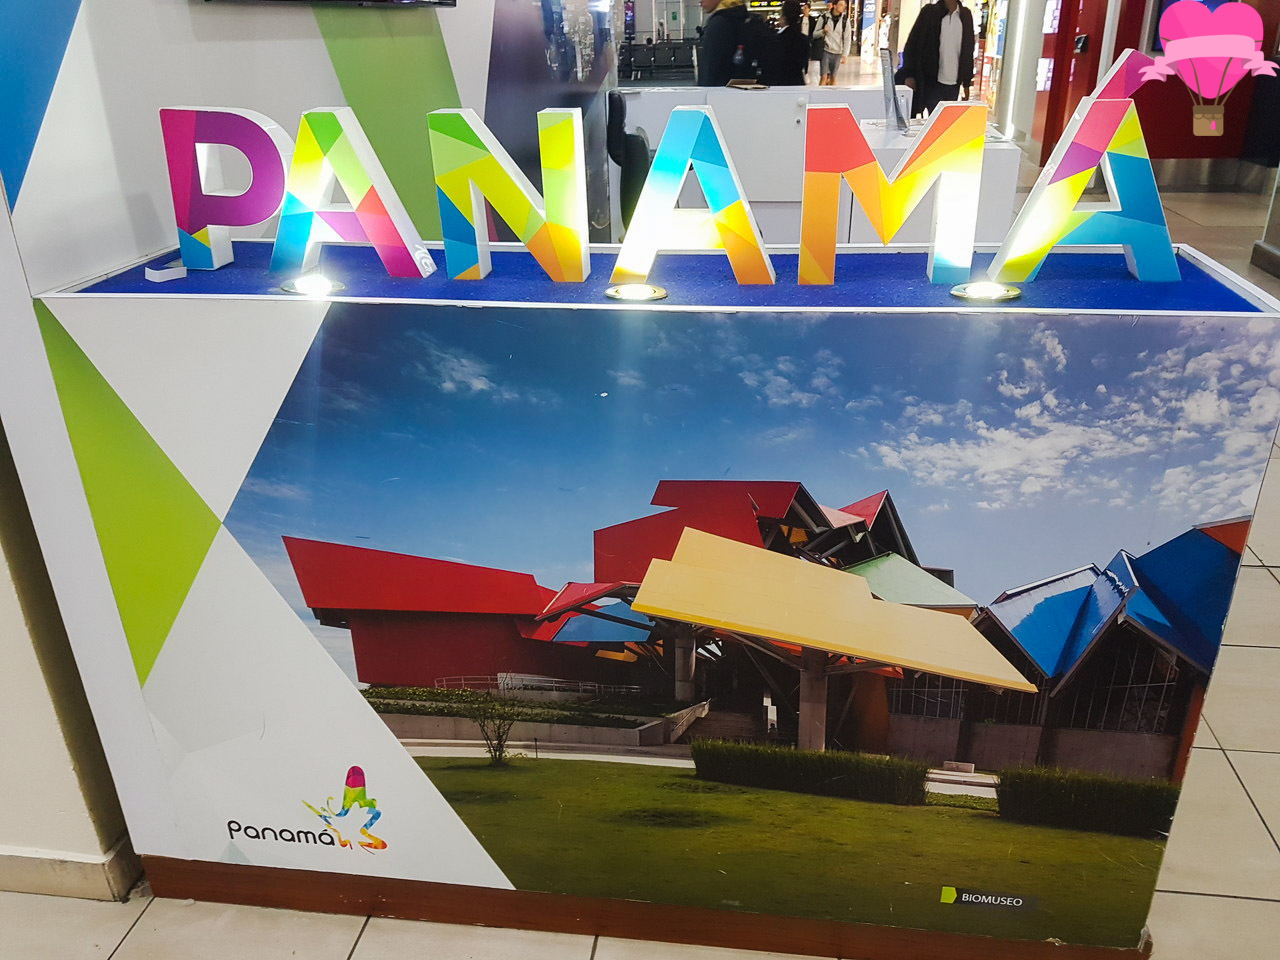 aeroporto-panama-conexao-cancun